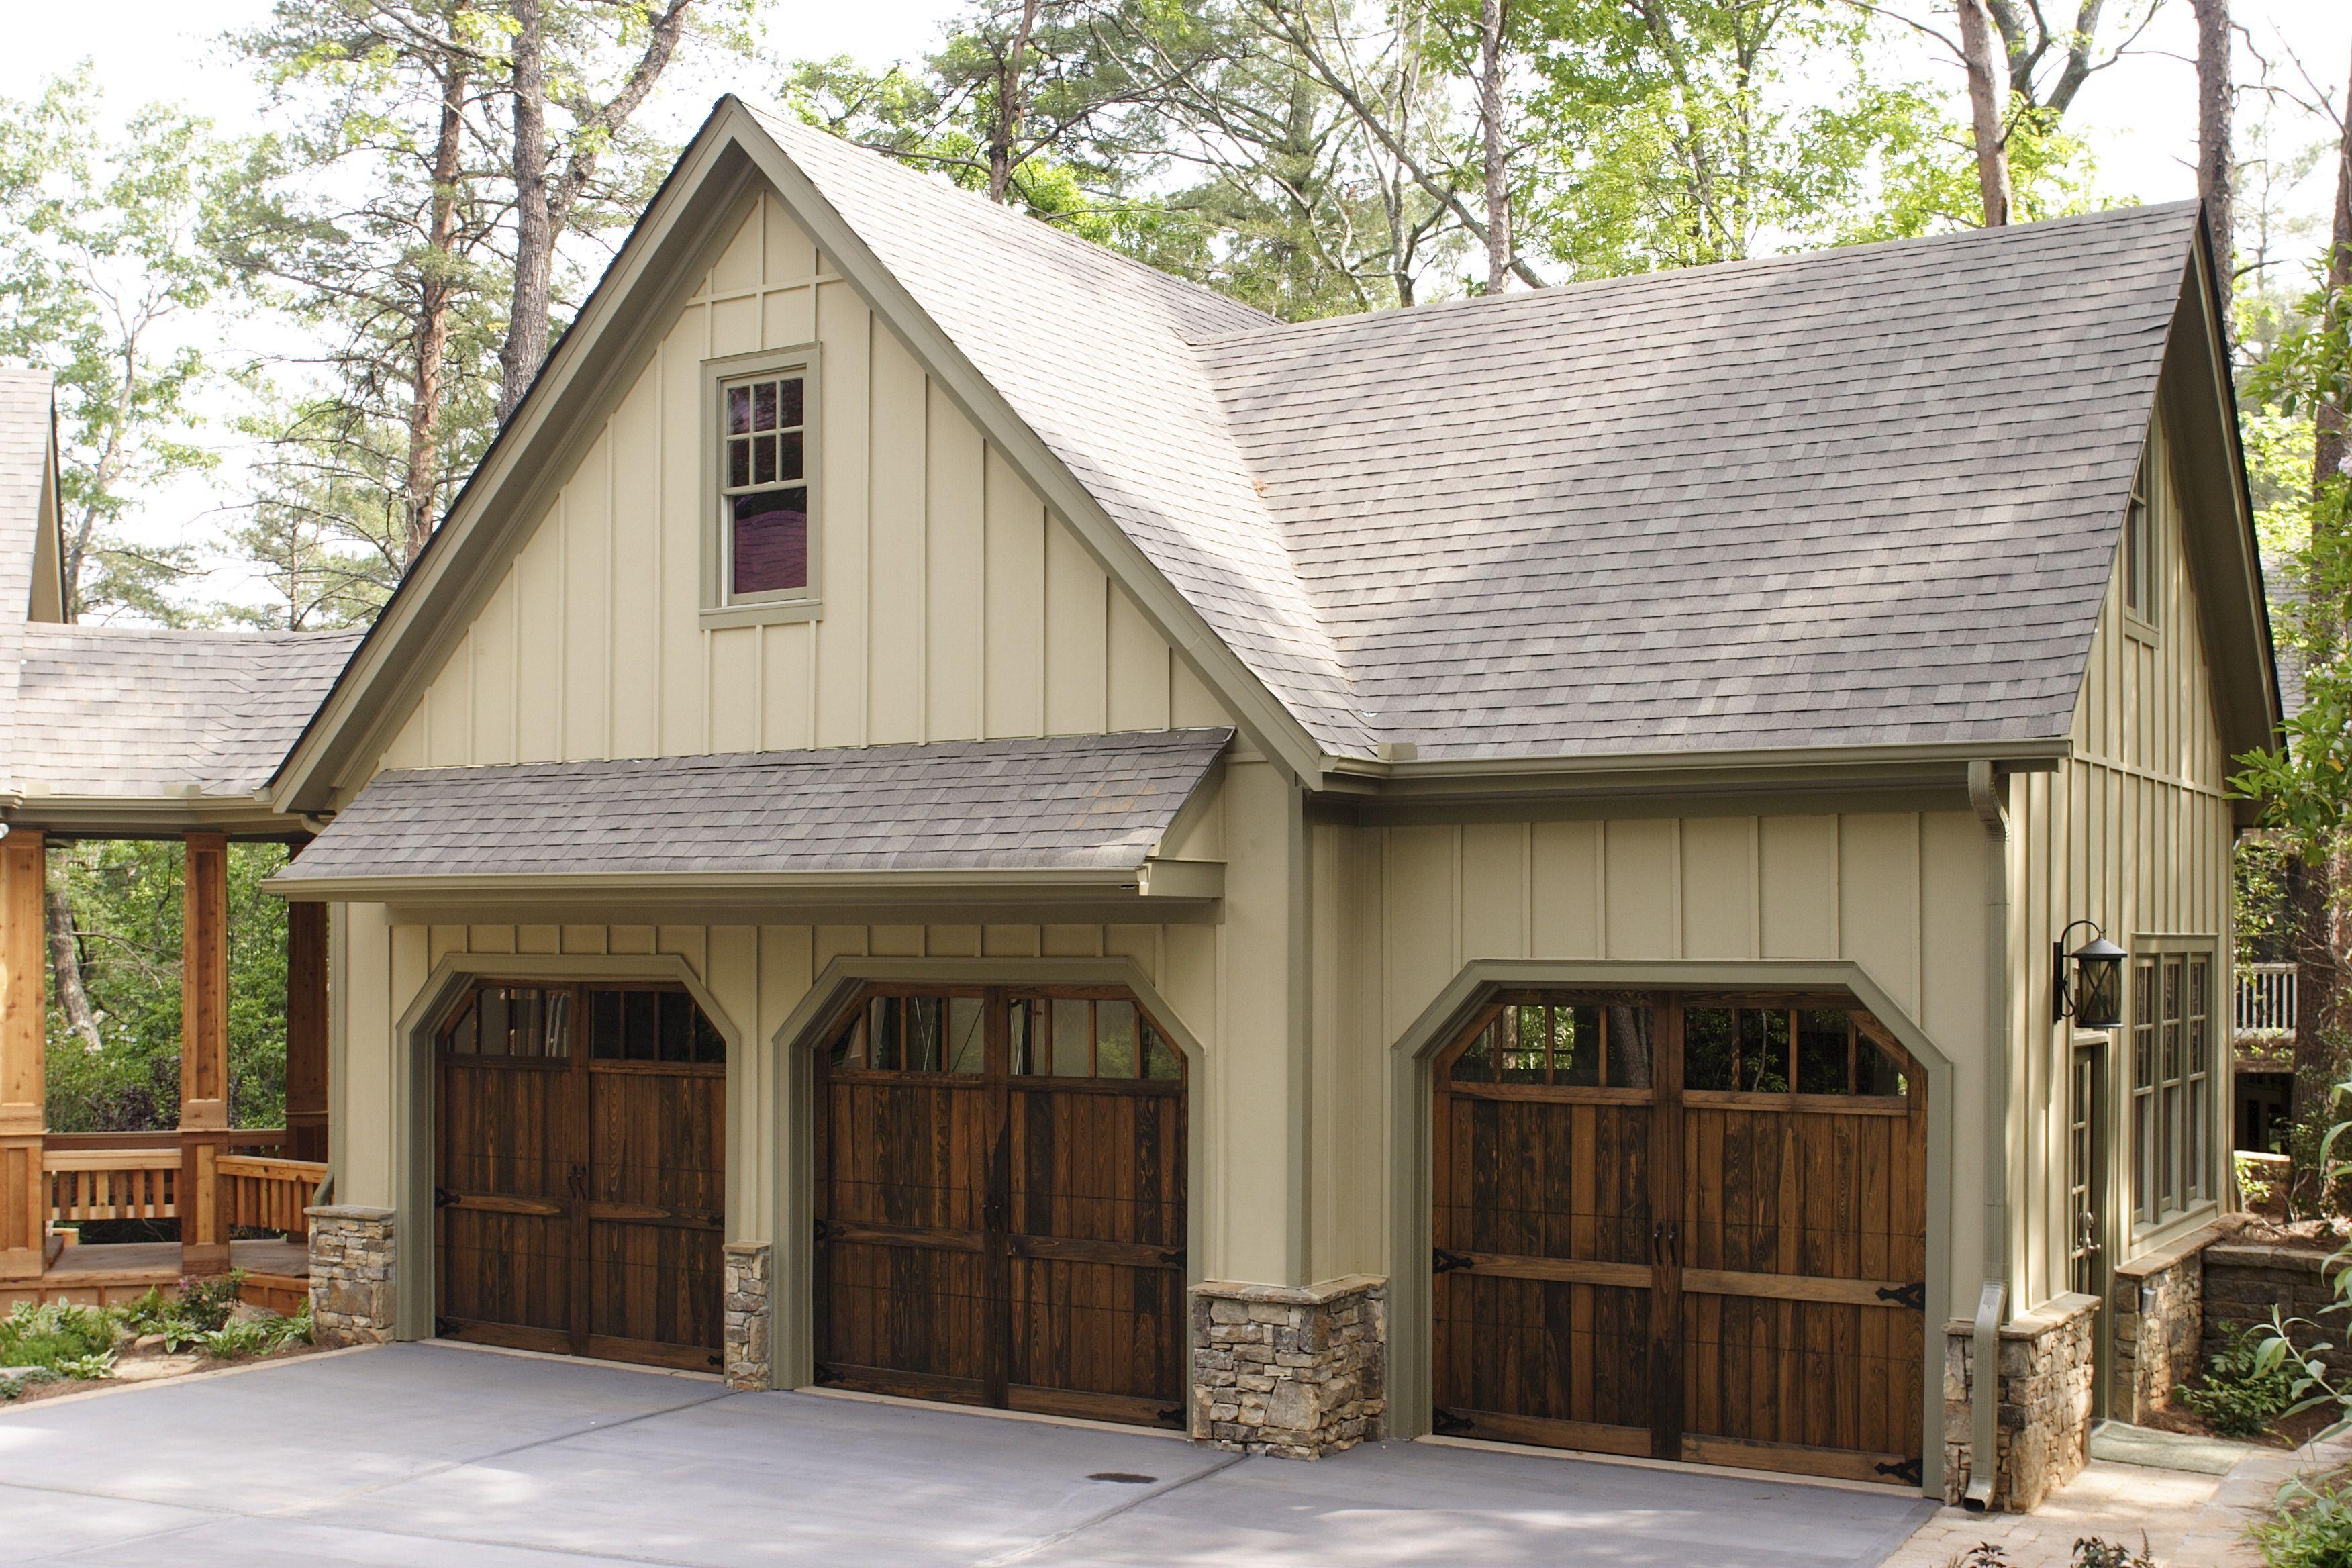 Wooden Garage Doors Give This Garage An Exquisite Homey Feel Remodels Include A Concrete Driveway Shingl Garage Door Design Garage Design Wooden Garage Doors